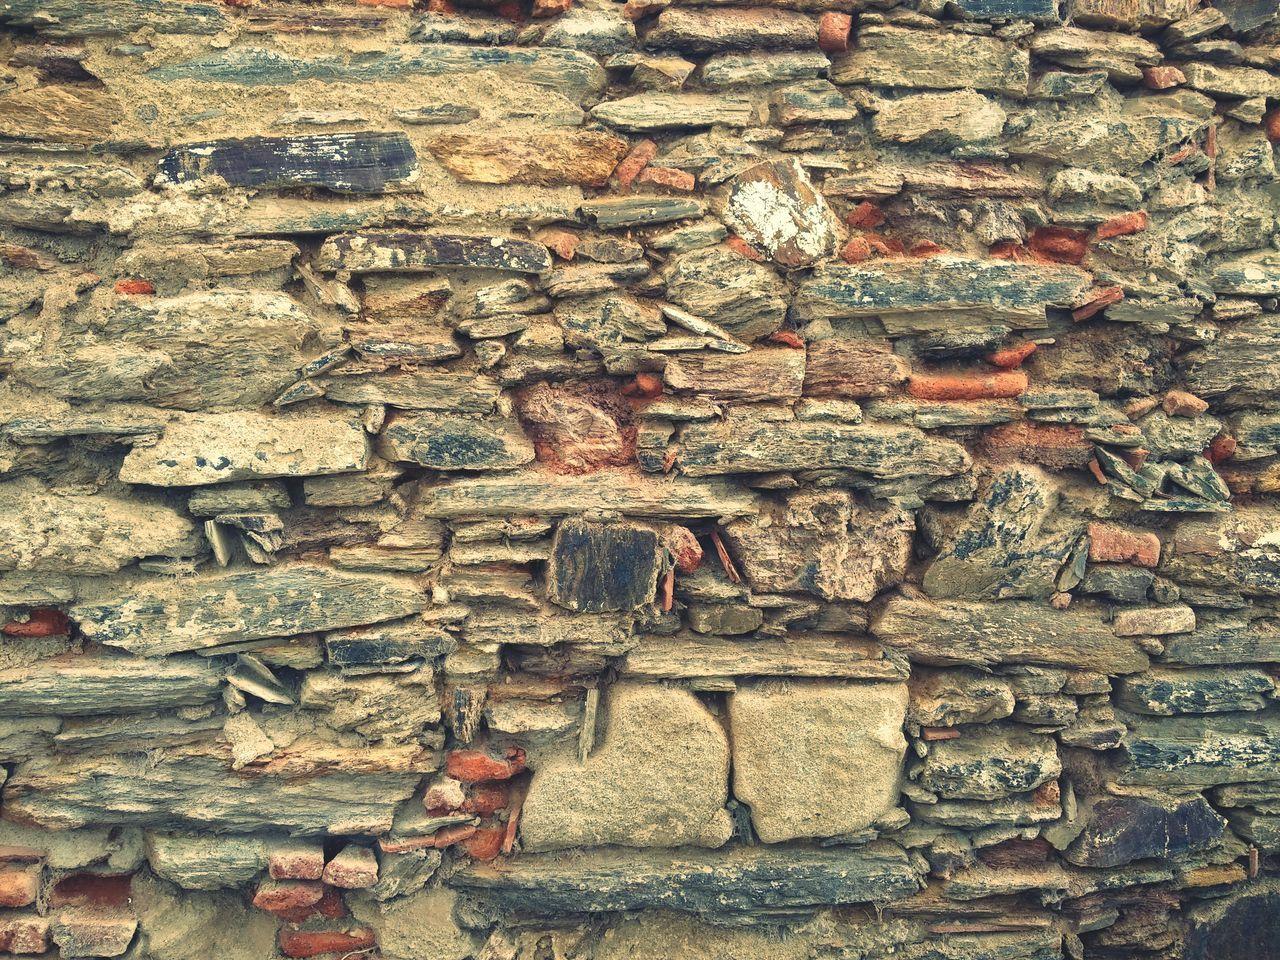 Muro em Monsaraz, Portugal Muro  Wall - Building Feature Xisto Shale Stones Old Castle Brown Fortification Sharish Saraz